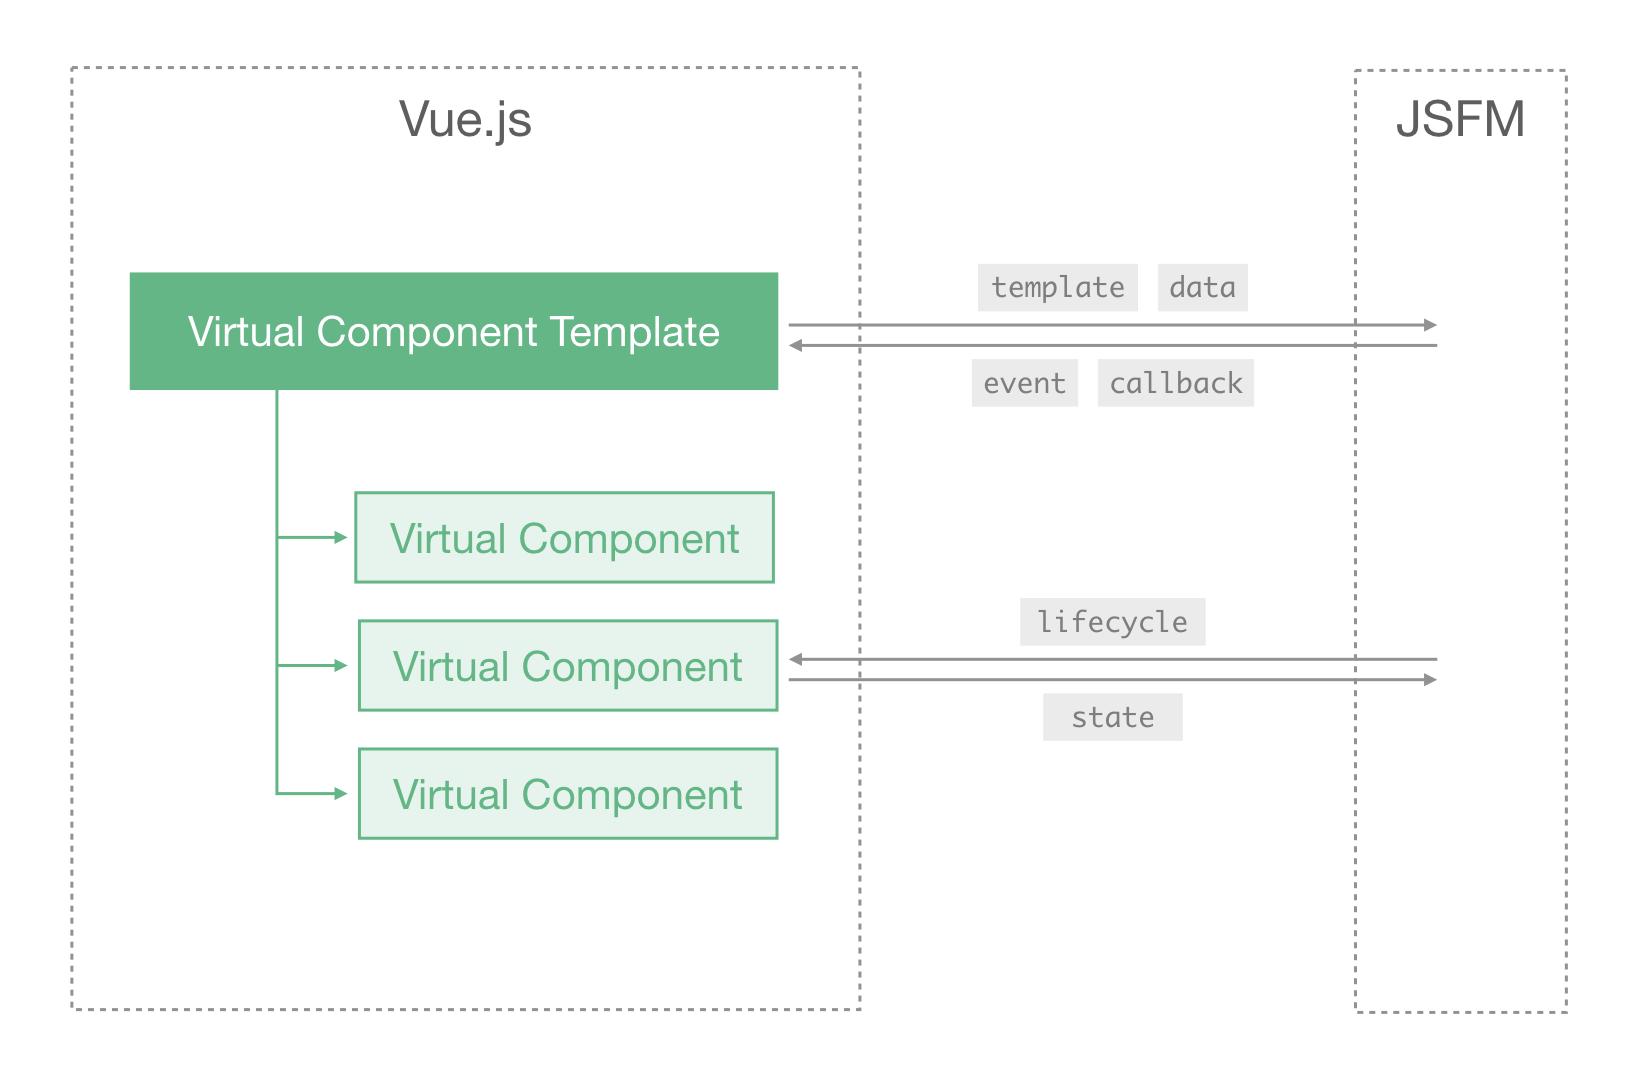 virtual component